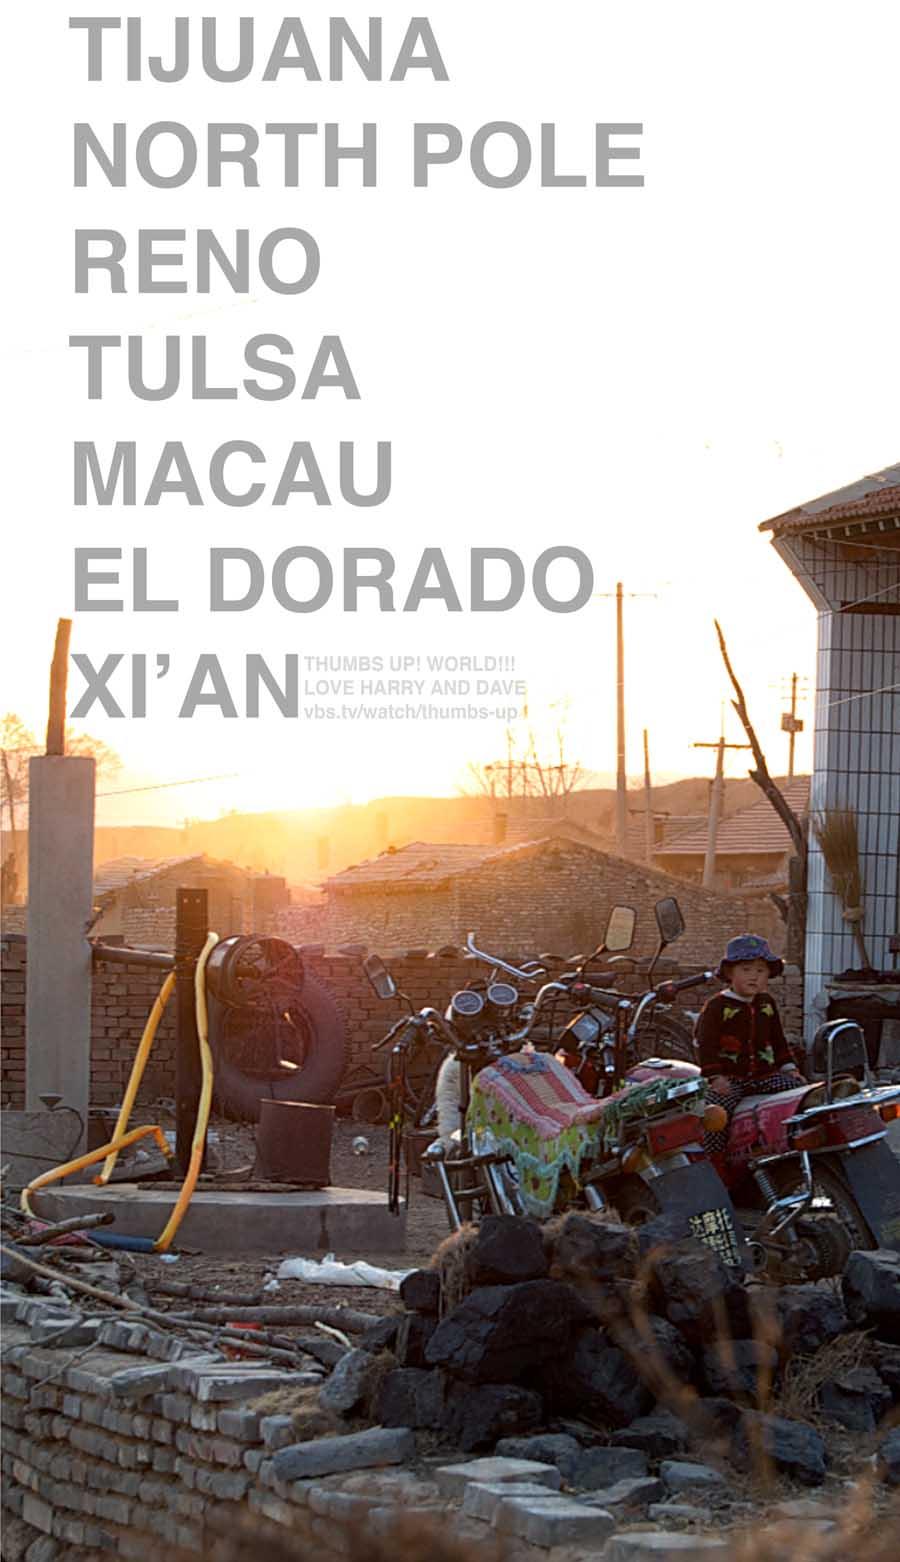 Thumbs Up! hitchhiking show poster - baby on a motercycle - Tijuana, North Pole, Reno, Tulsa, Macau, El Dorado, Xi'an